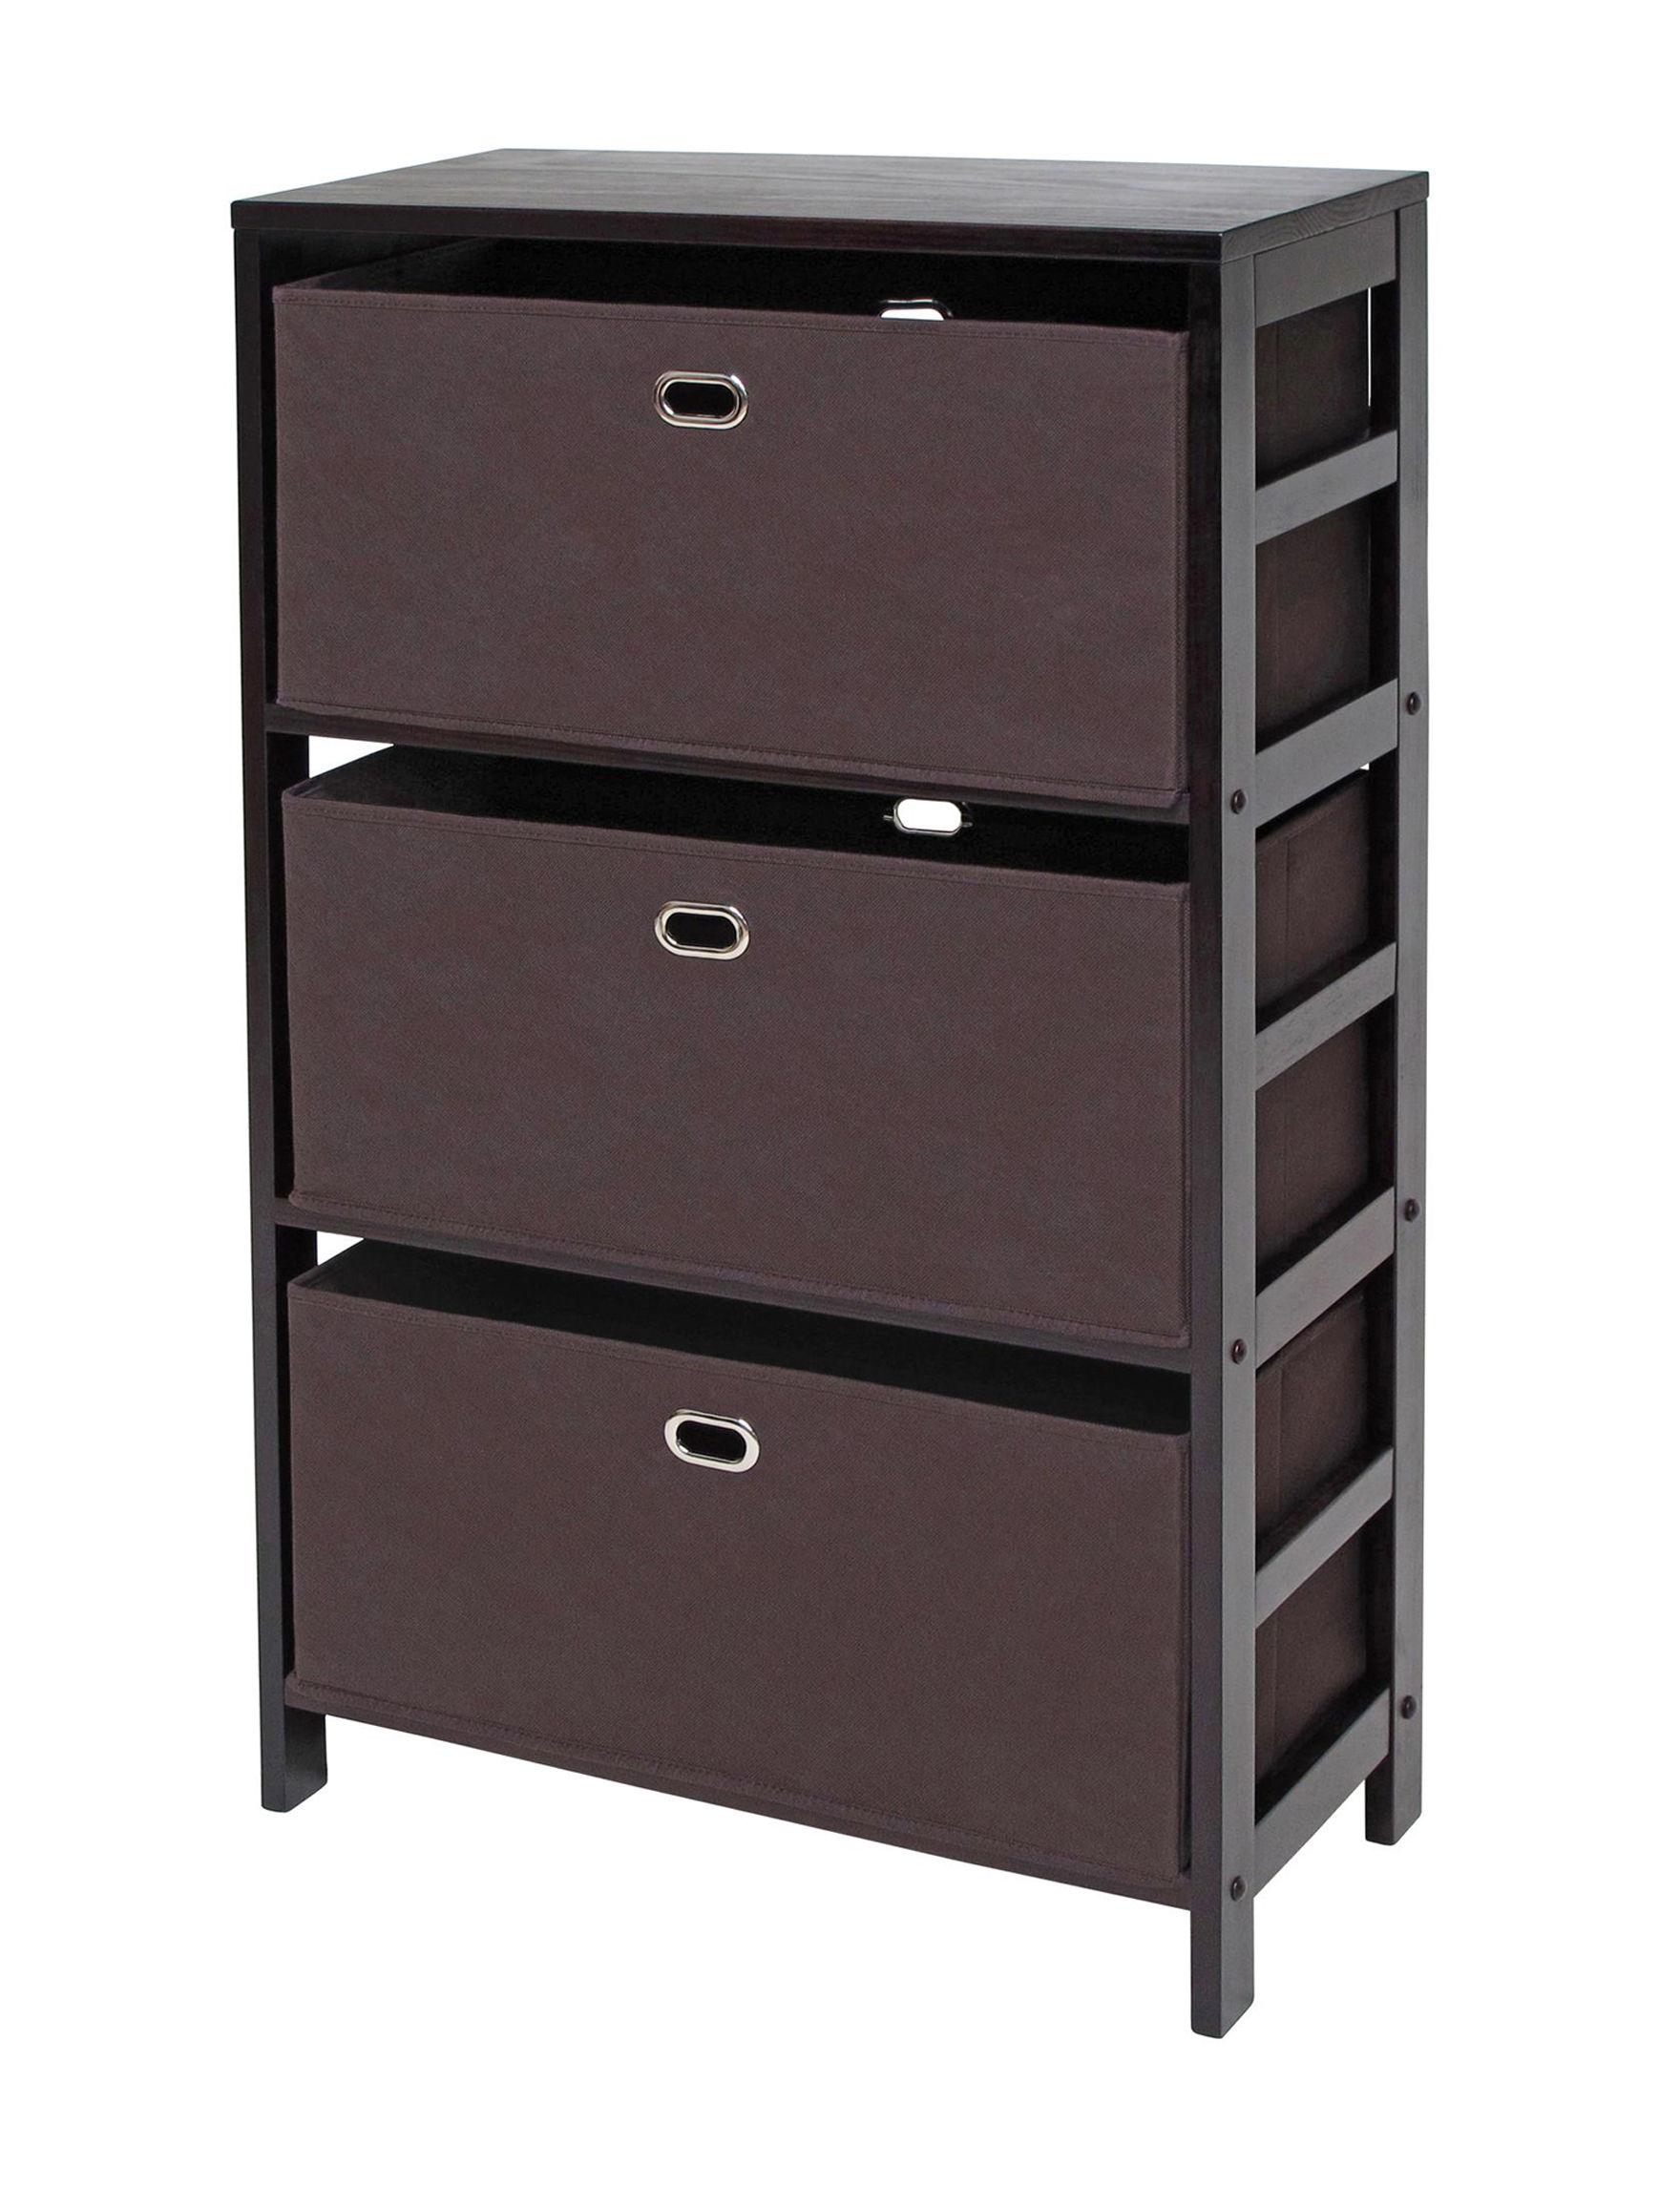 Winsome Chocolate Storage Shelves Living Room Furniture Storage & Organization